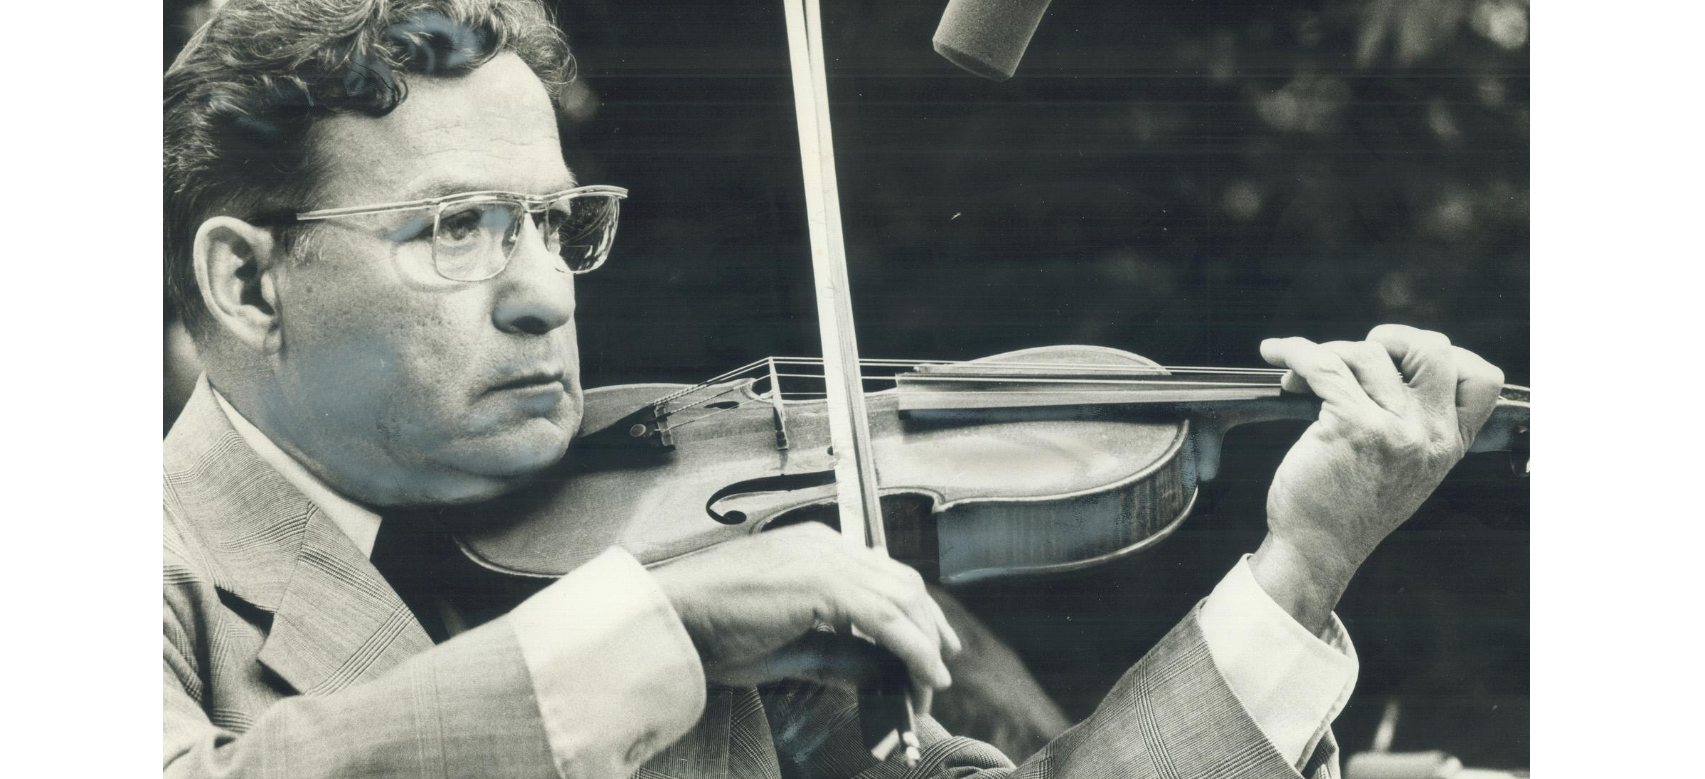 Jean Carignan, famous Quebecois fiddler